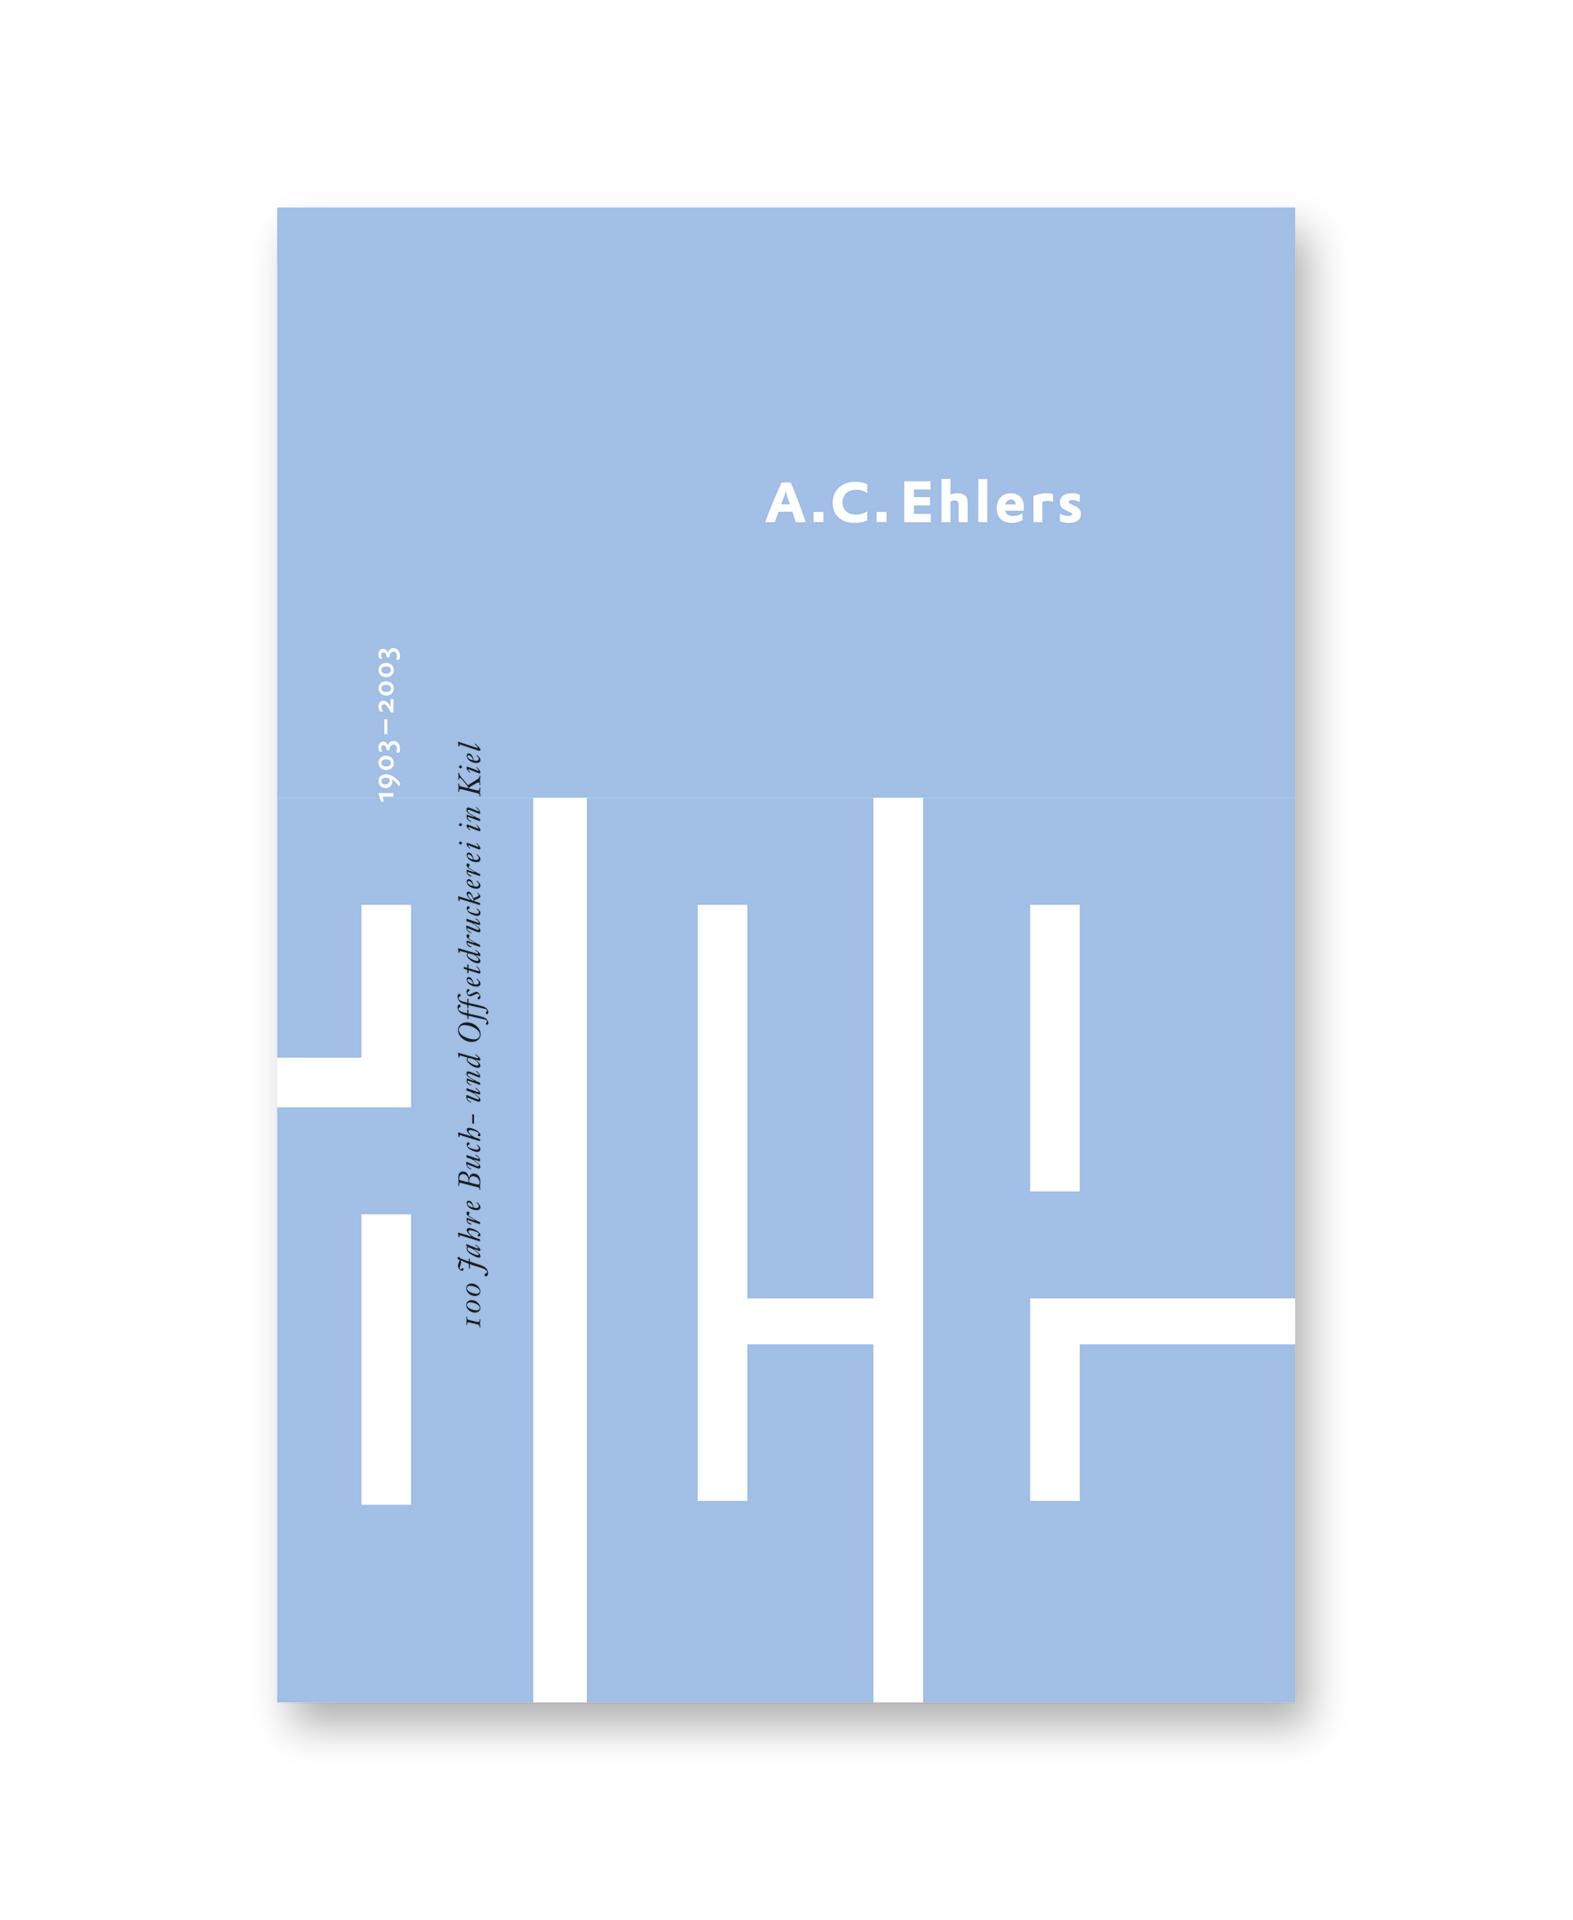 2003_AC_Ehlers